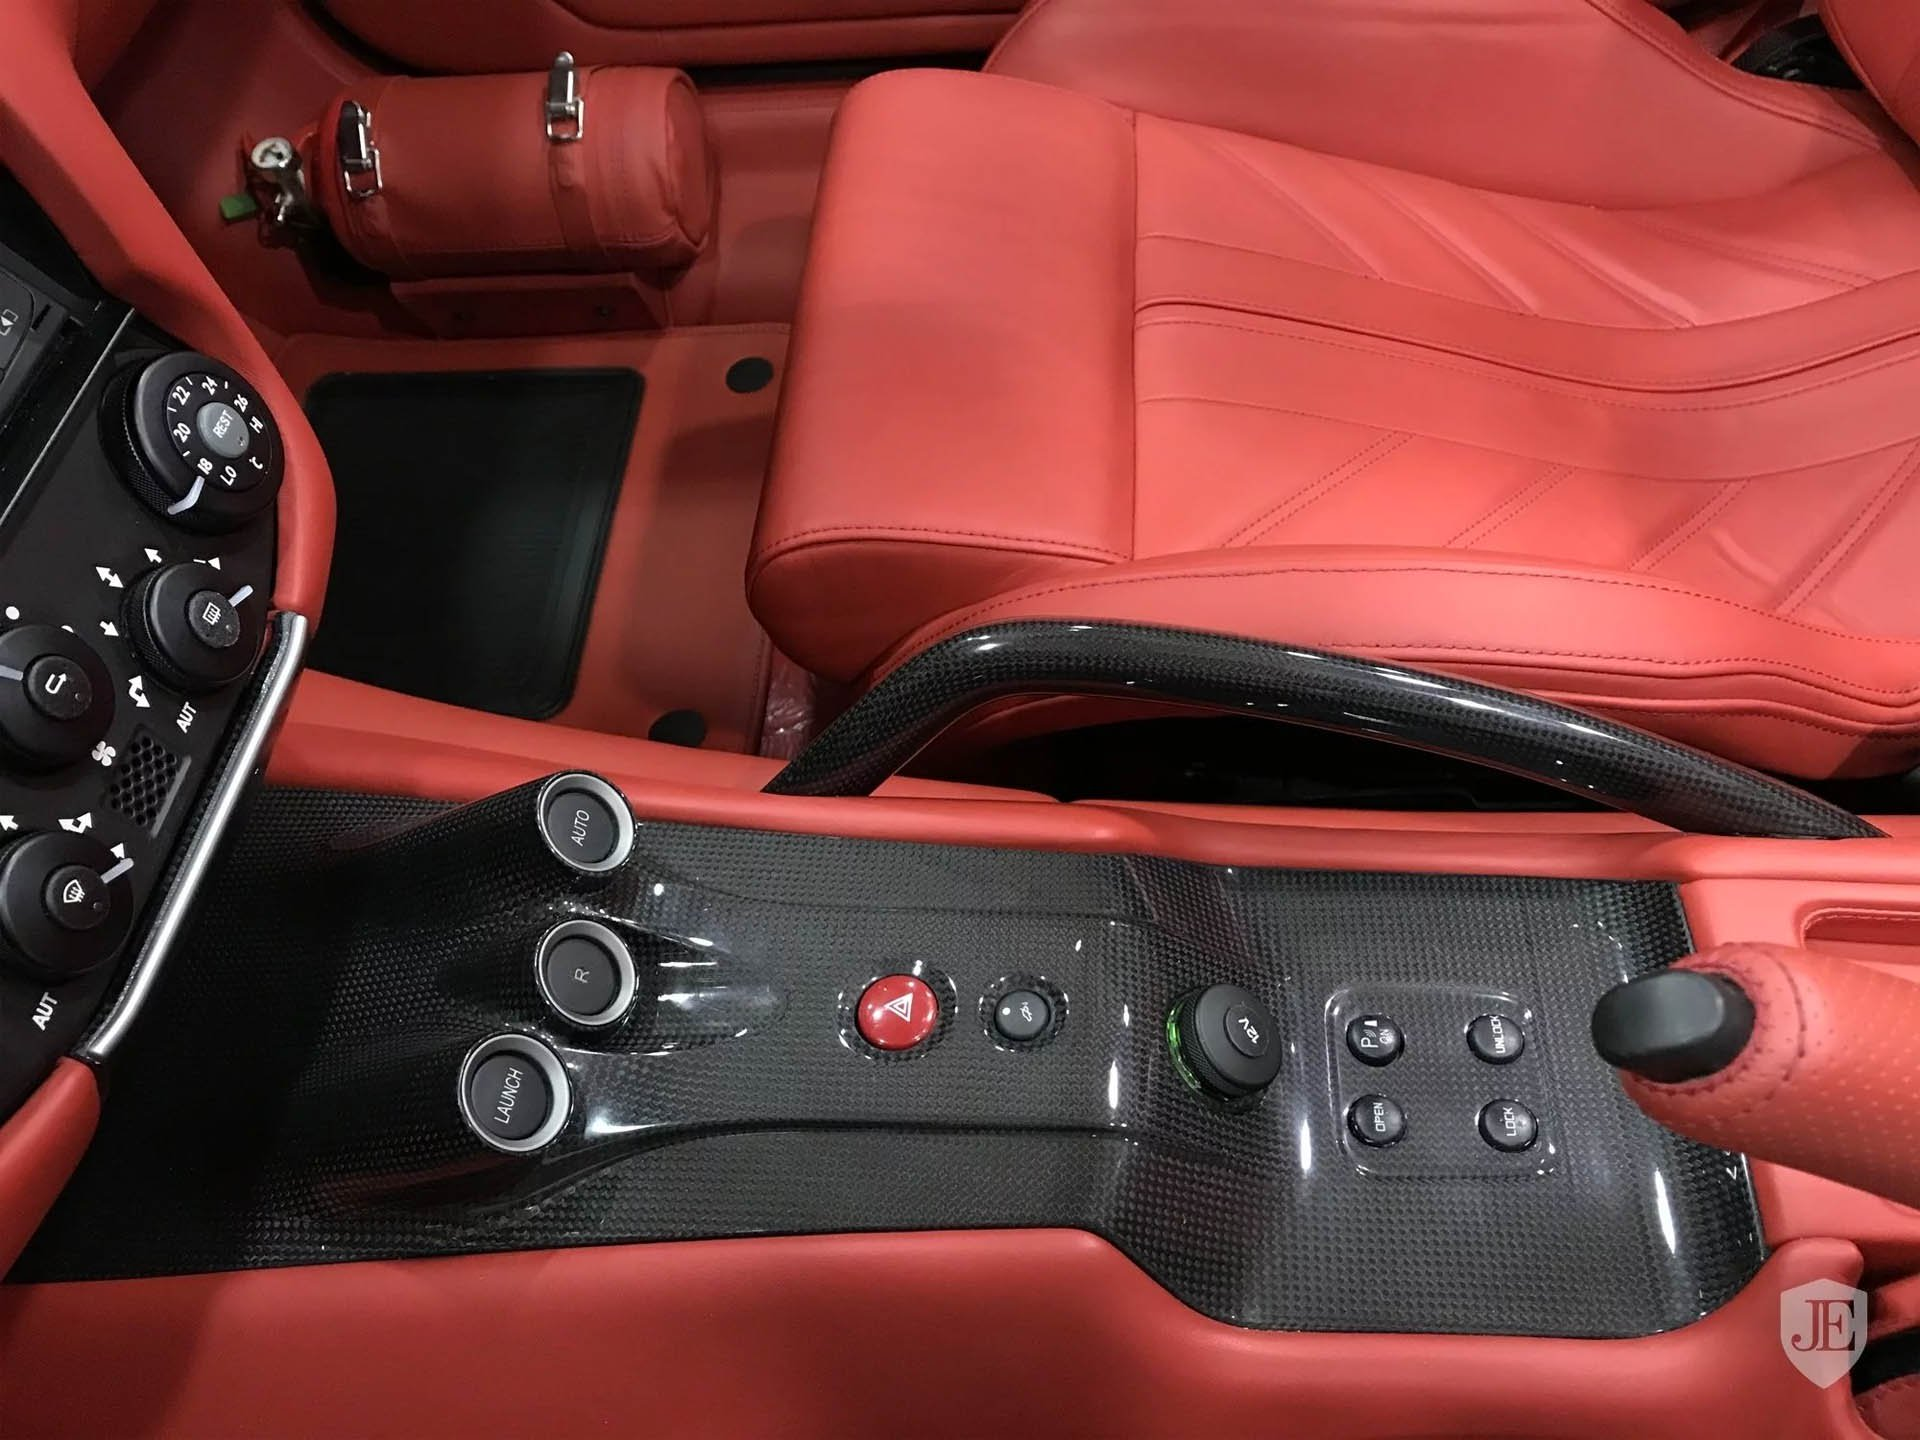 Ferrari_599_SA_Aperta_for_sale_0003